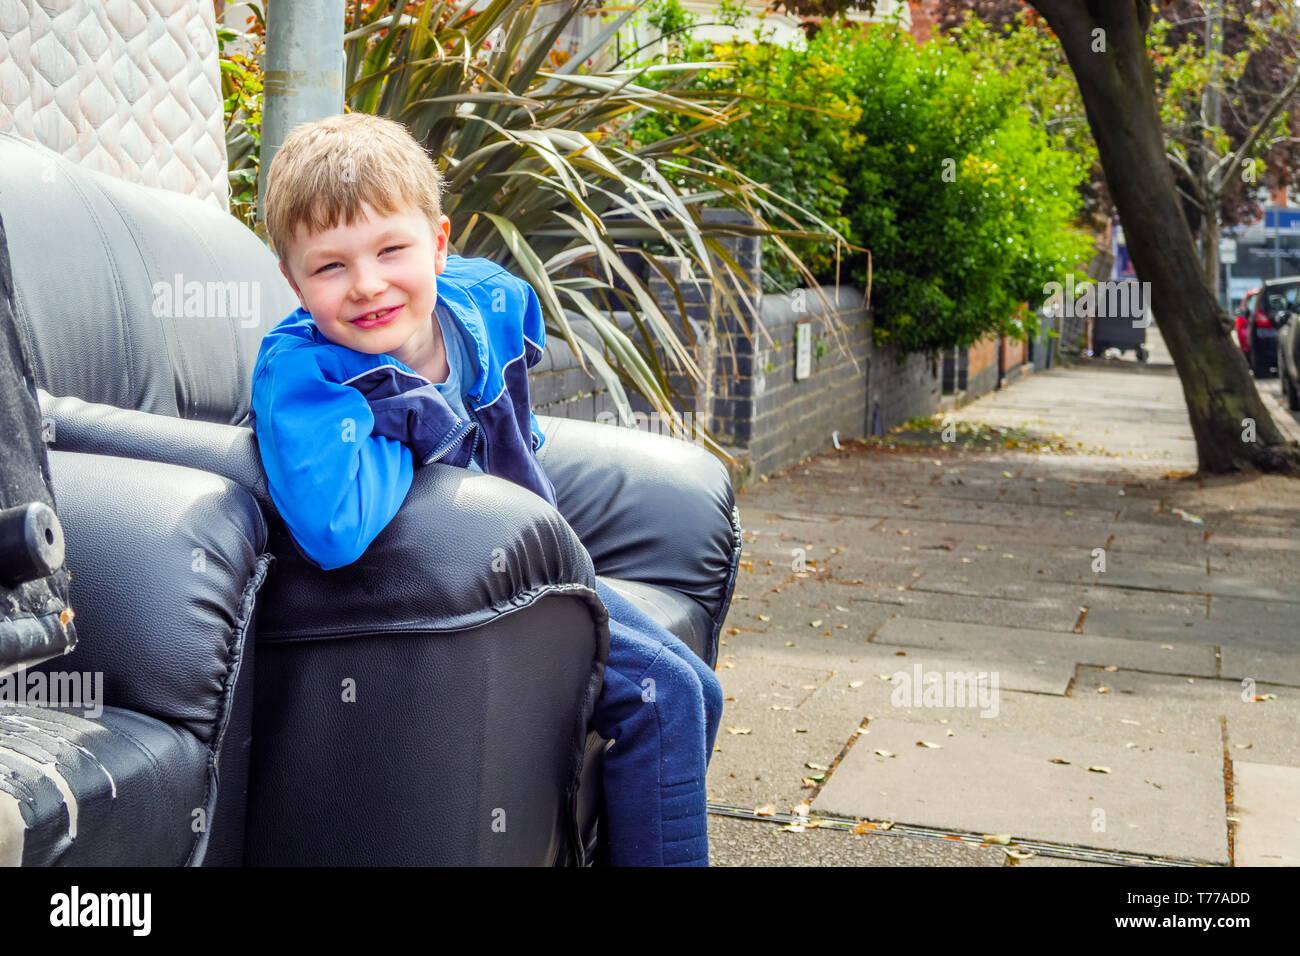 cute child on dumped sofa sitting on british street in training kit. - Stock Image